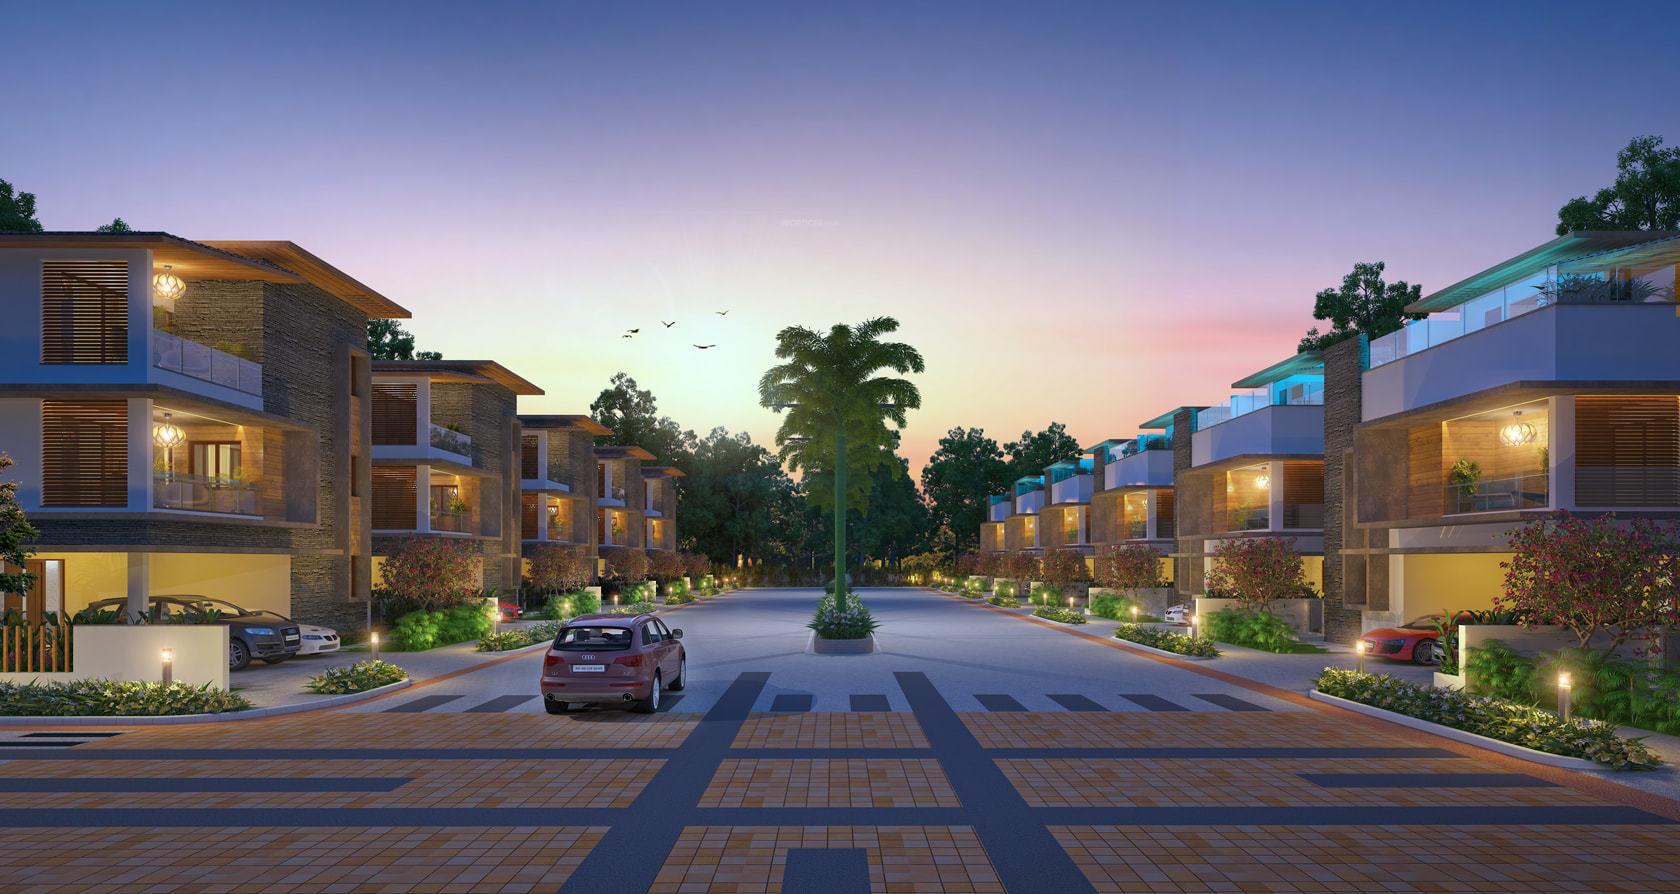 Luxury House in Hyderabad - Buy Luxury Independent Villas